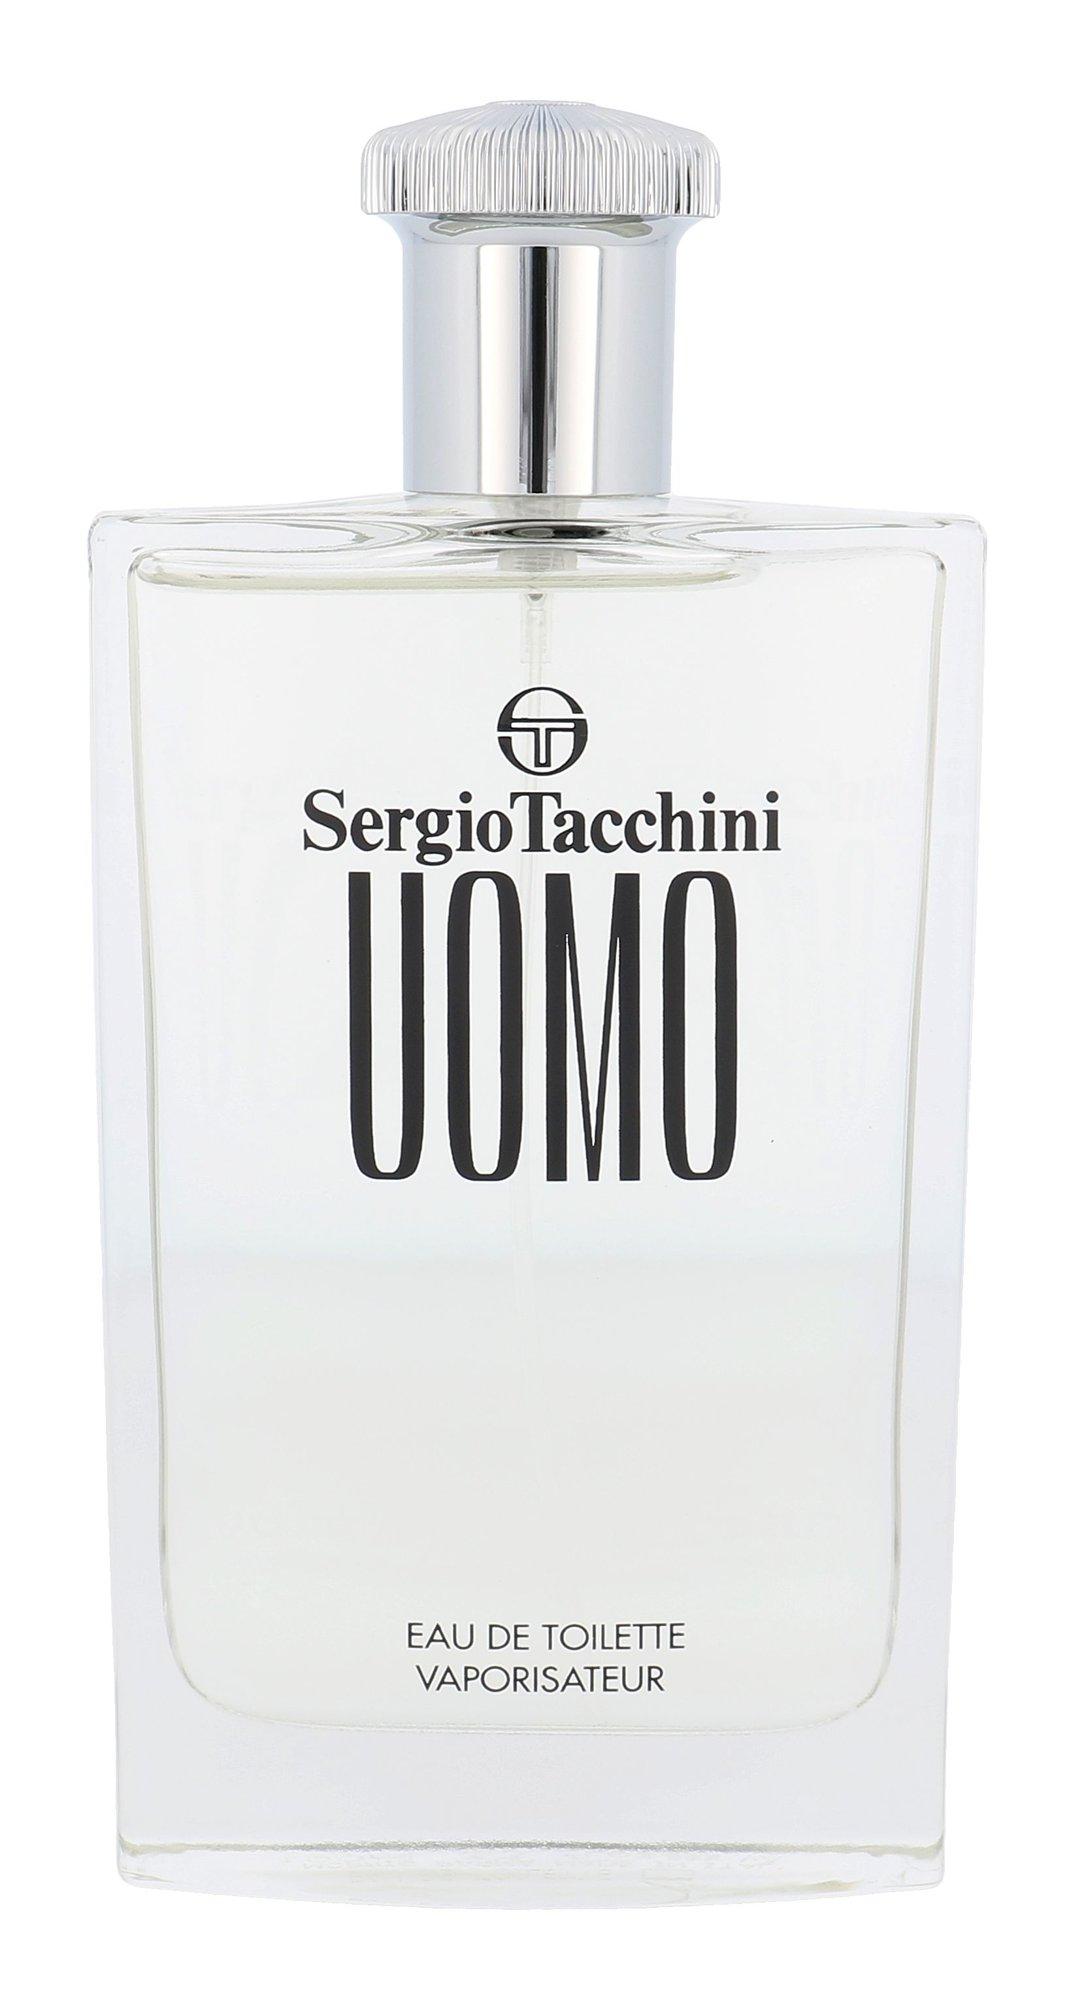 Sergio Tacchini Uomo EDT 100ml